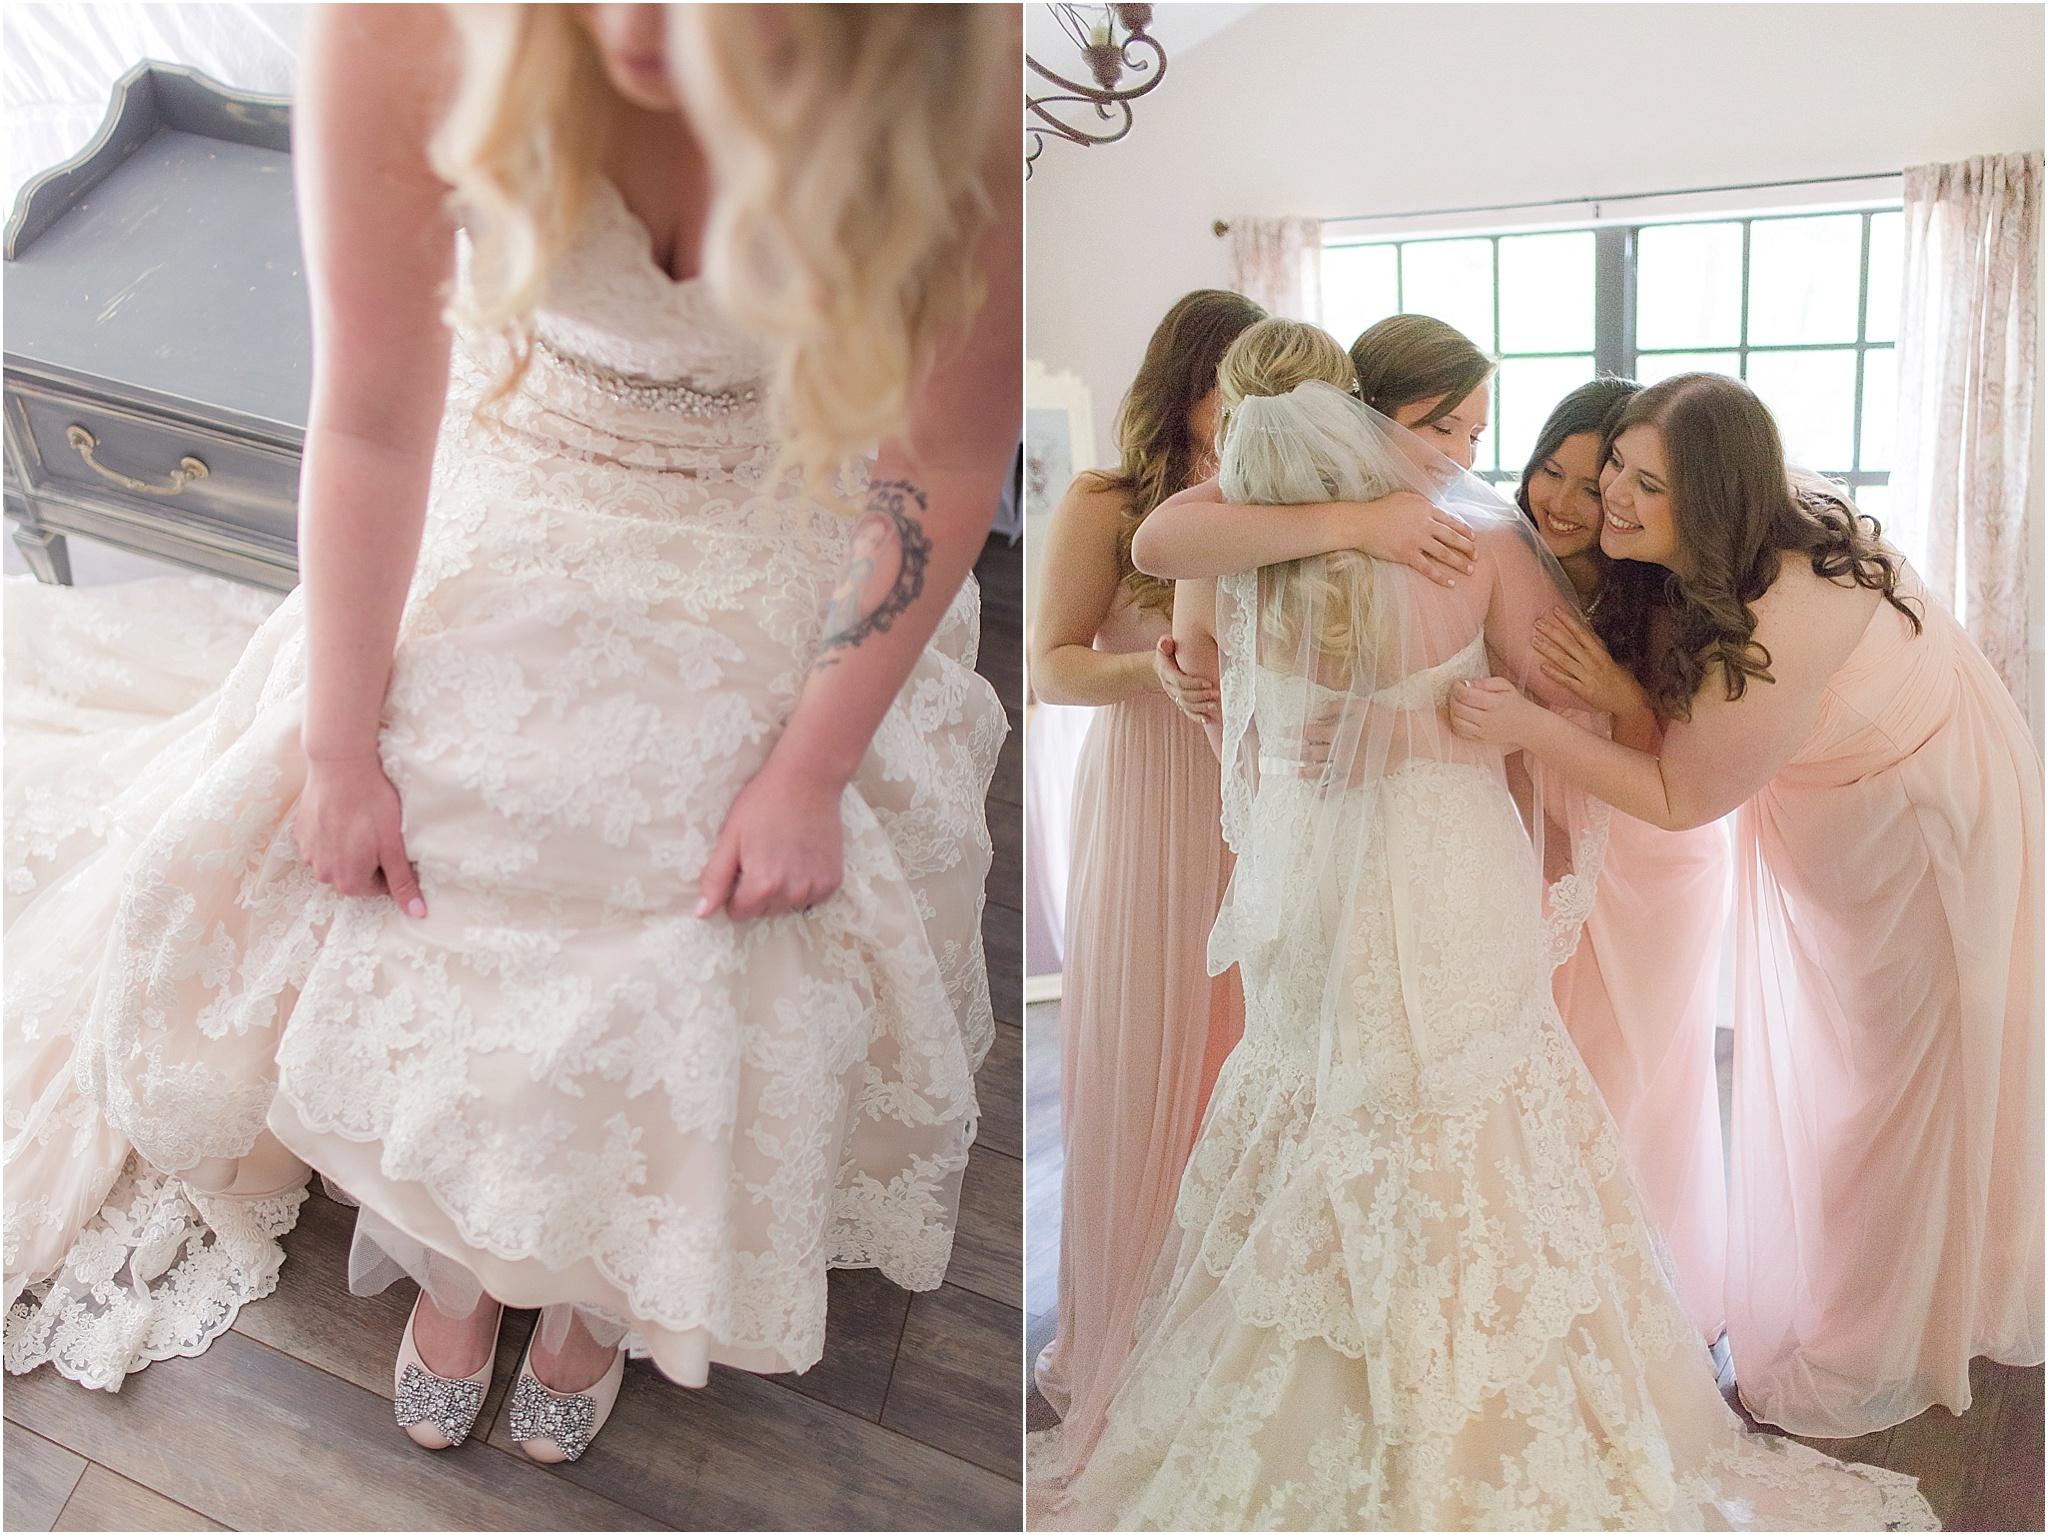 Romantic blush bride getting ready moments